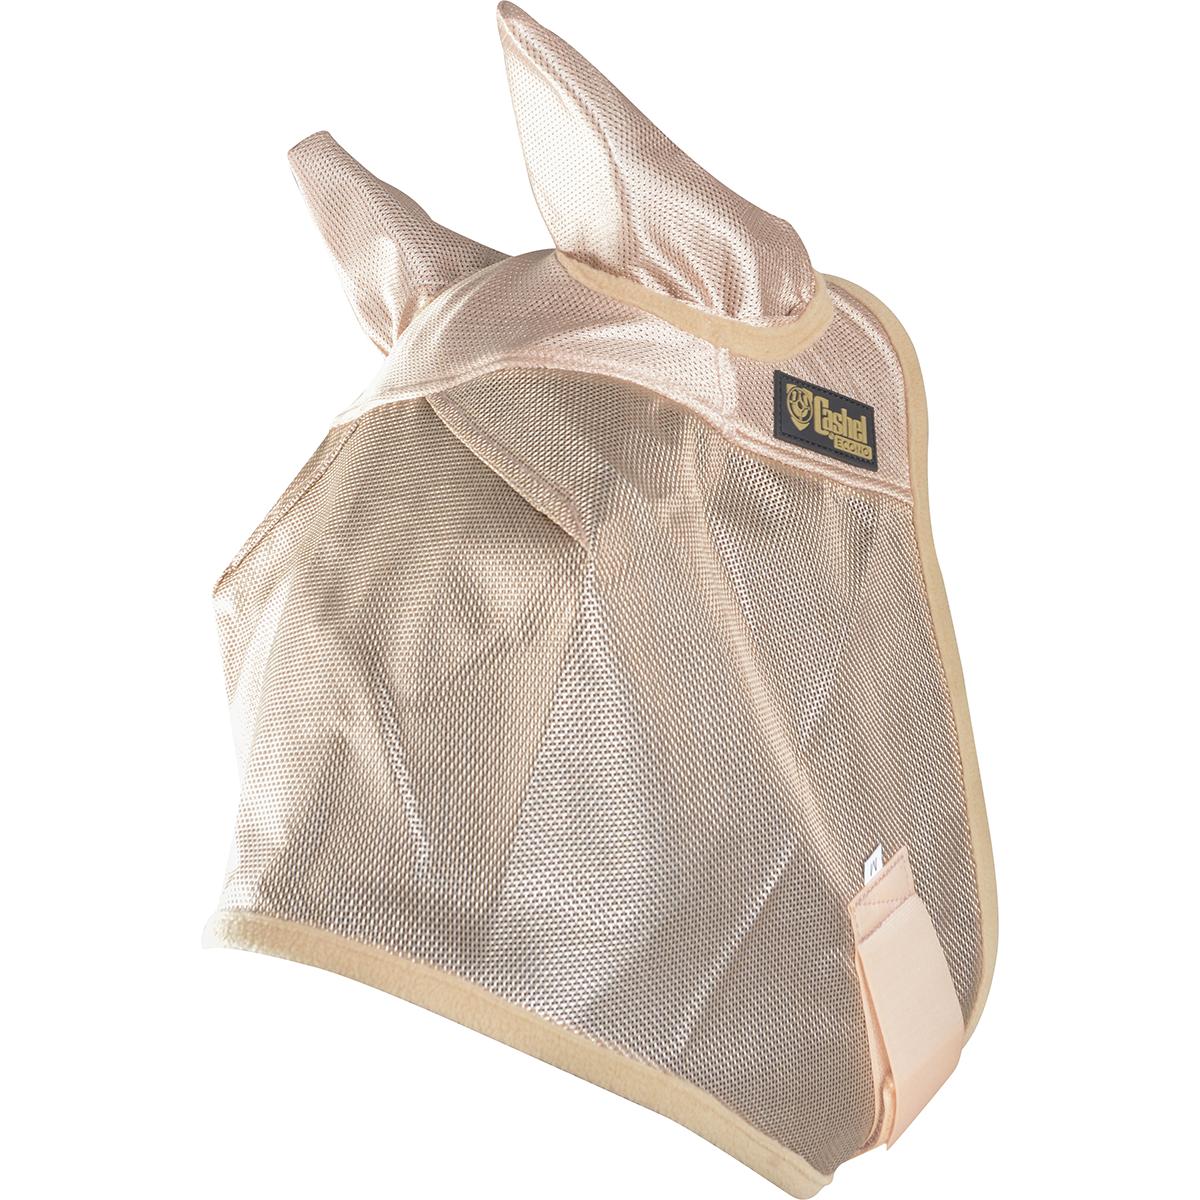 Cashel Cashel Eco Fly Mask - Standard with Ears